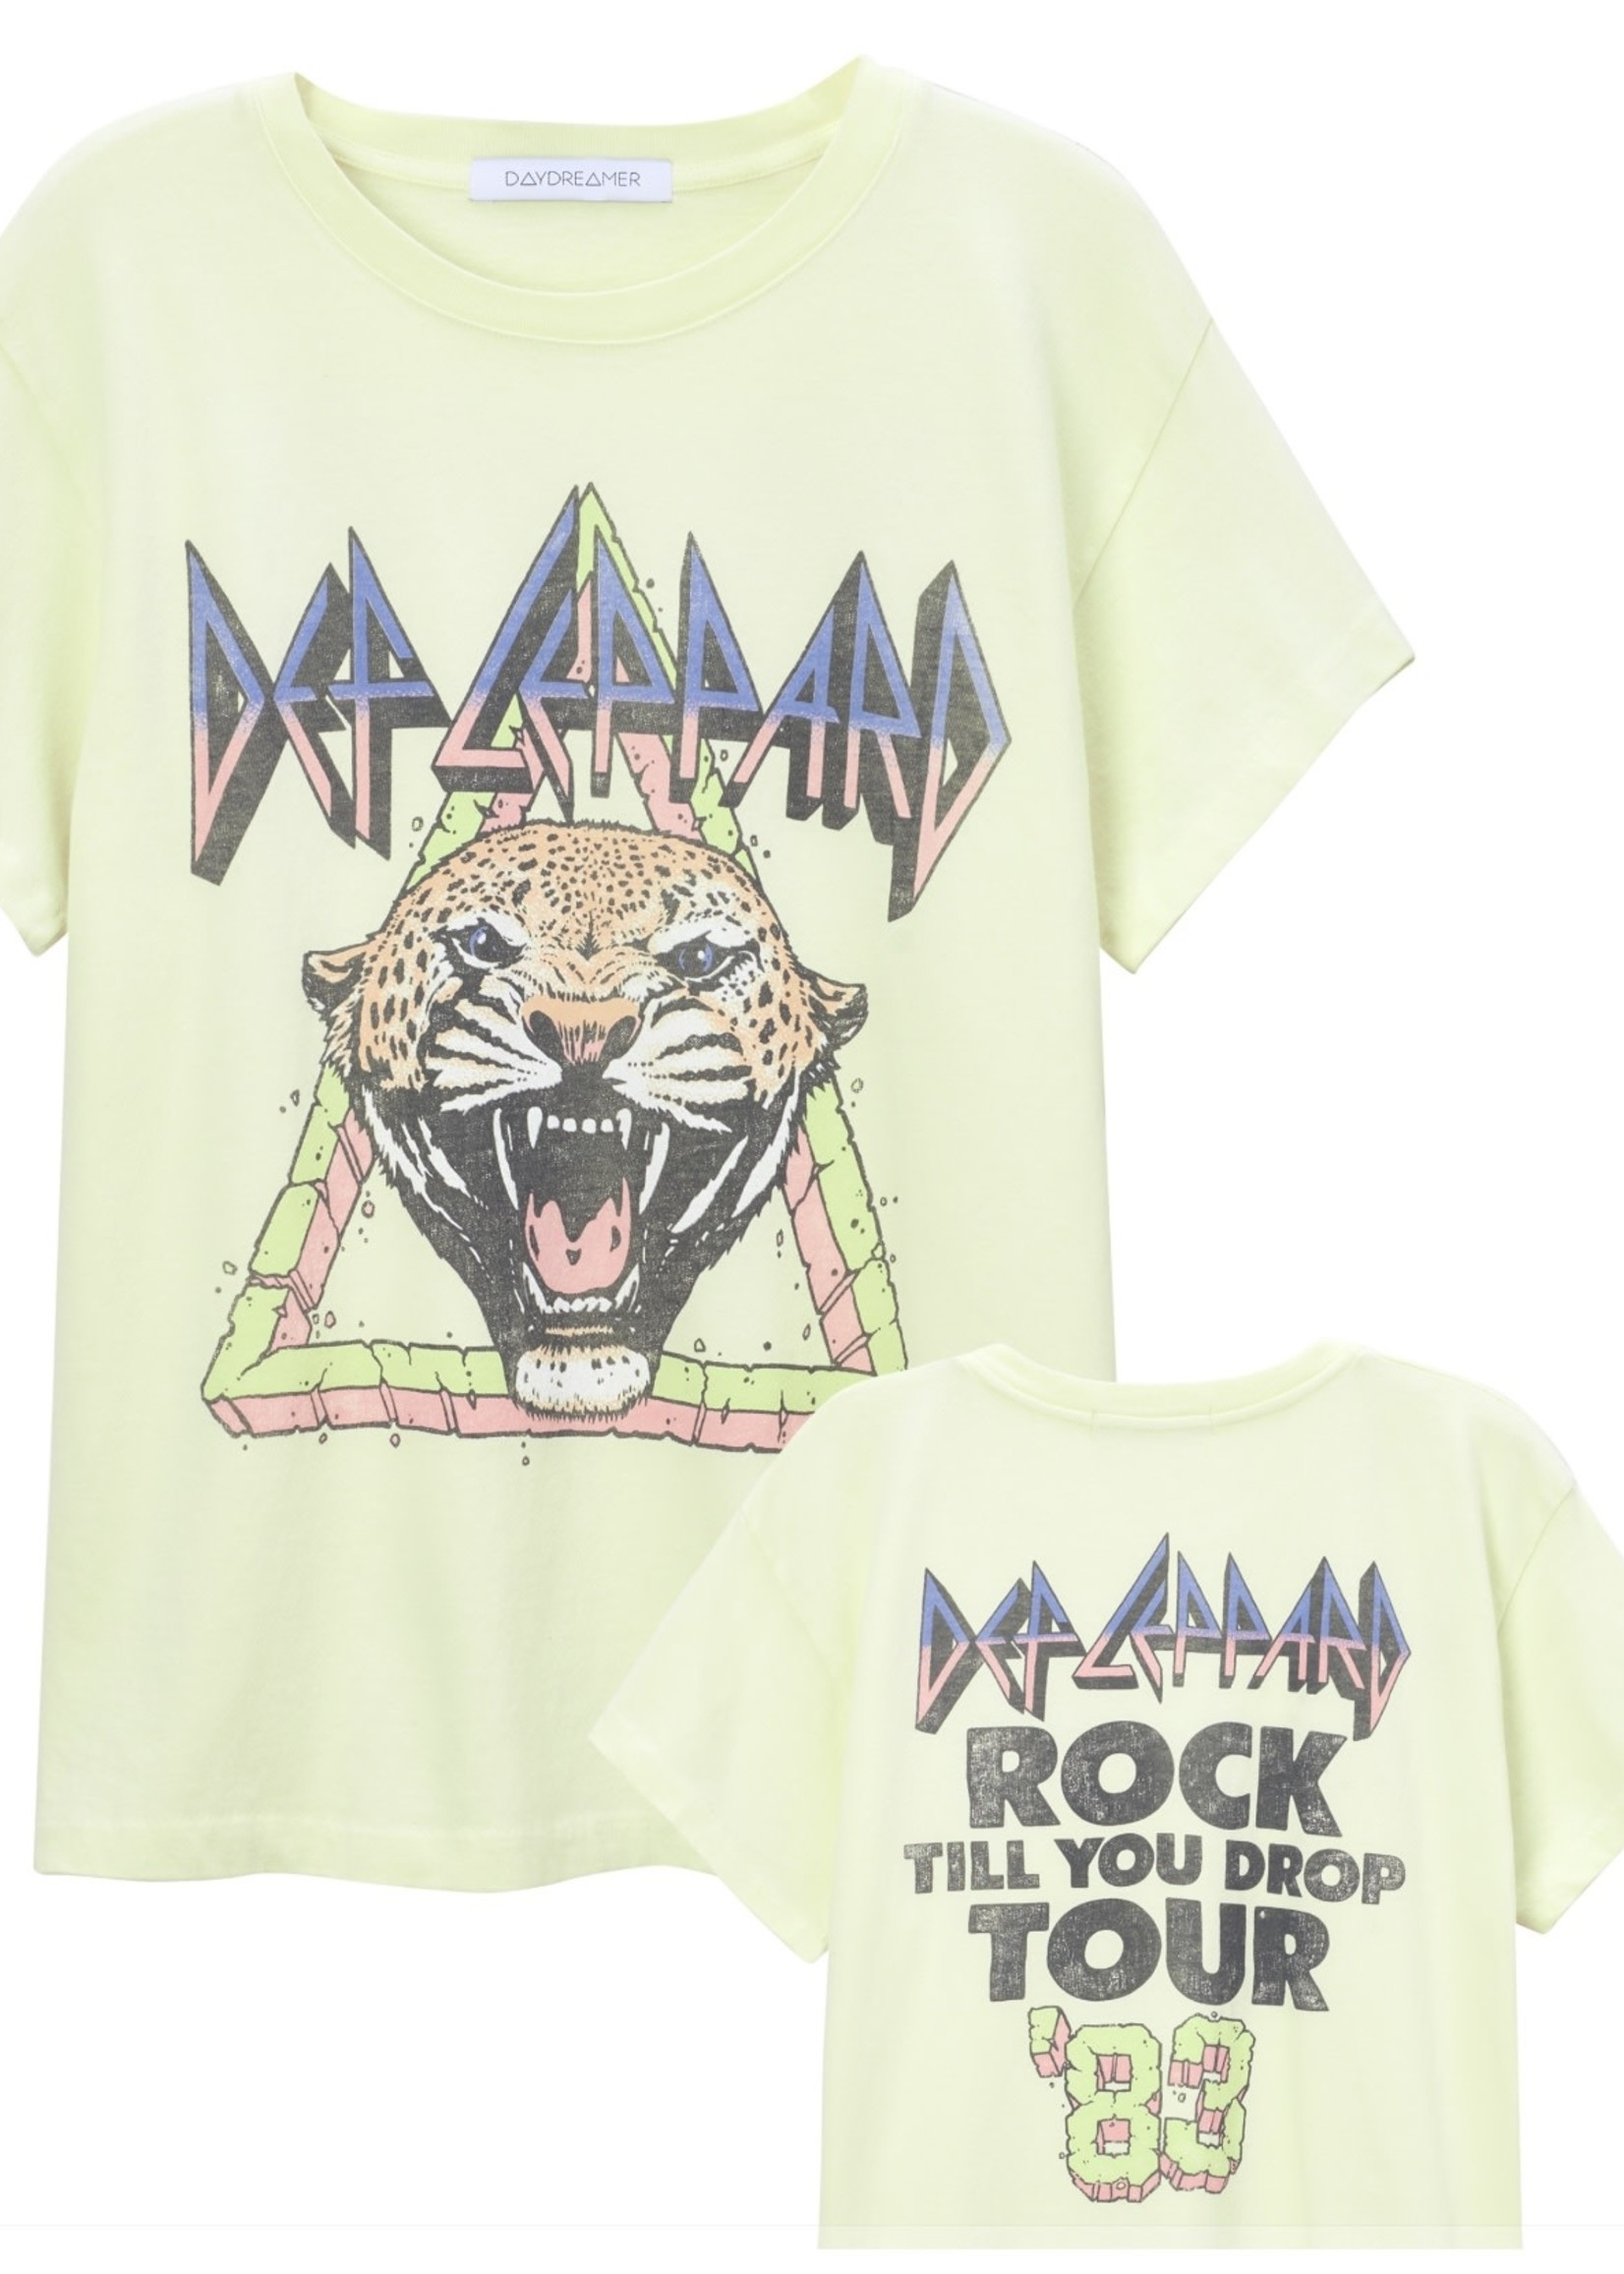 DayDreamer Def Leppard Rock Til You Drop Tee